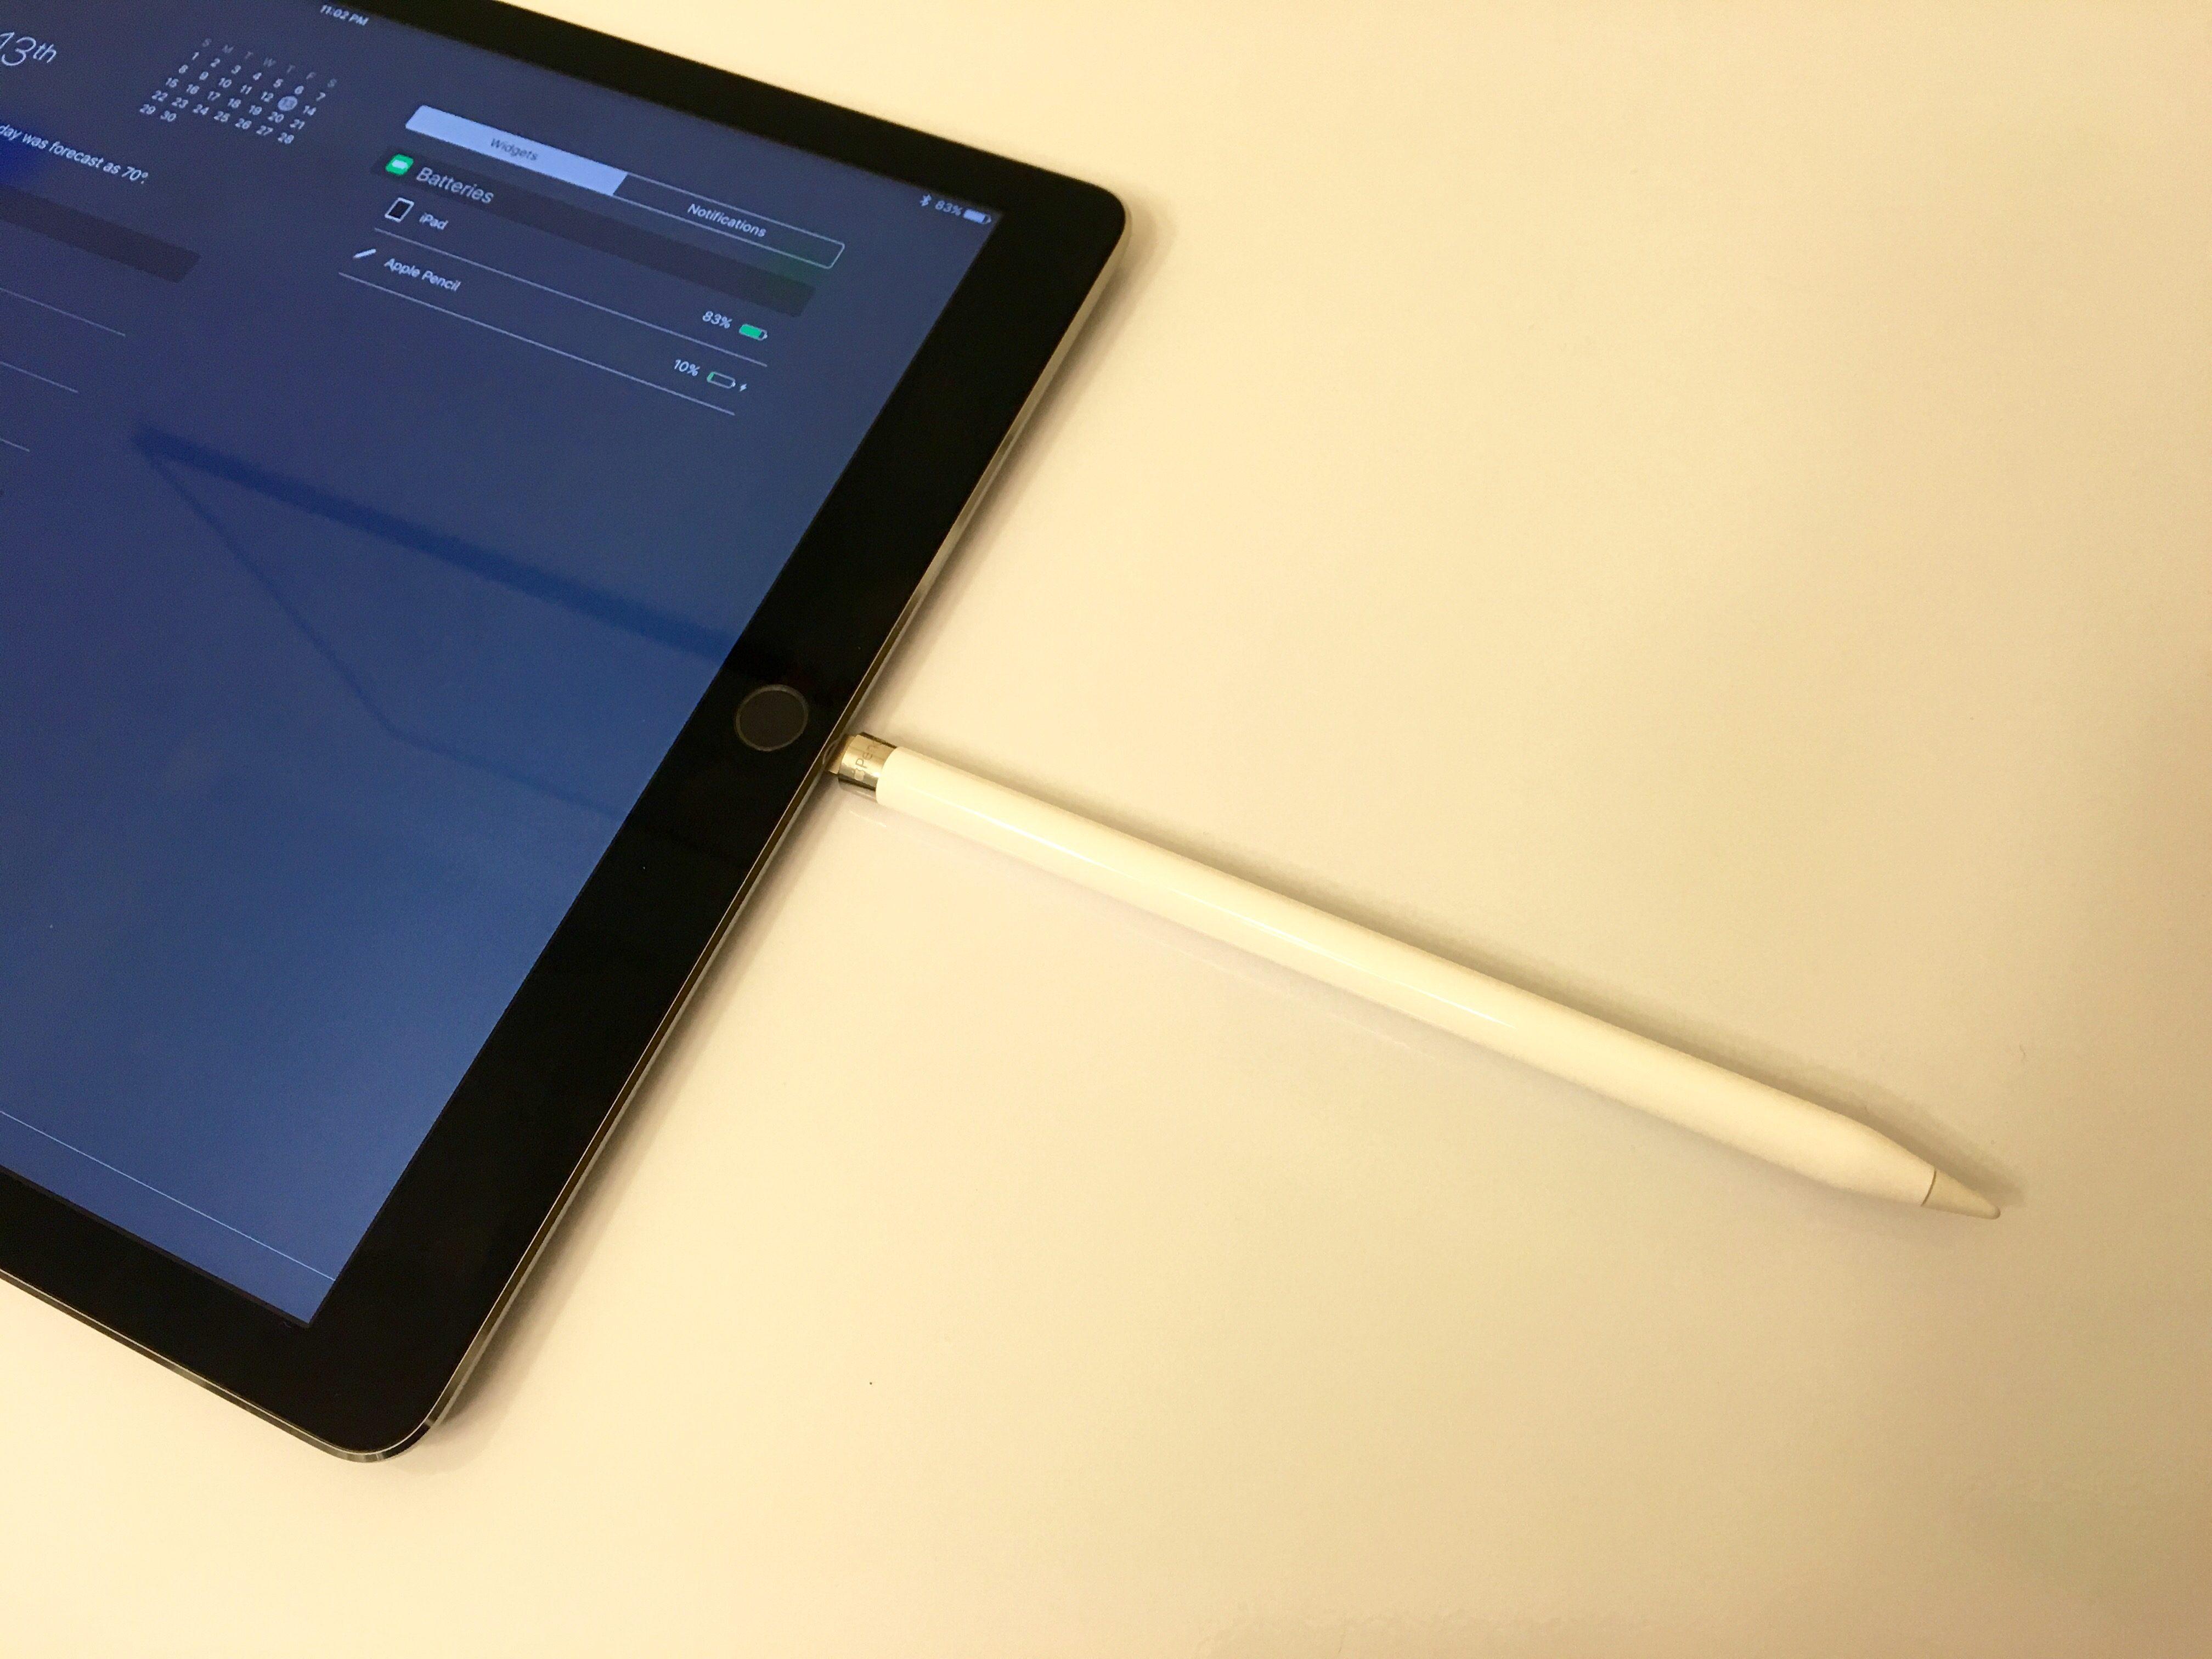 "<span href=""https://9to5mac.com/2018/10/31/charge-apple-pencil/"">¿Cómo a cargo de Apple Lápiz</a>"